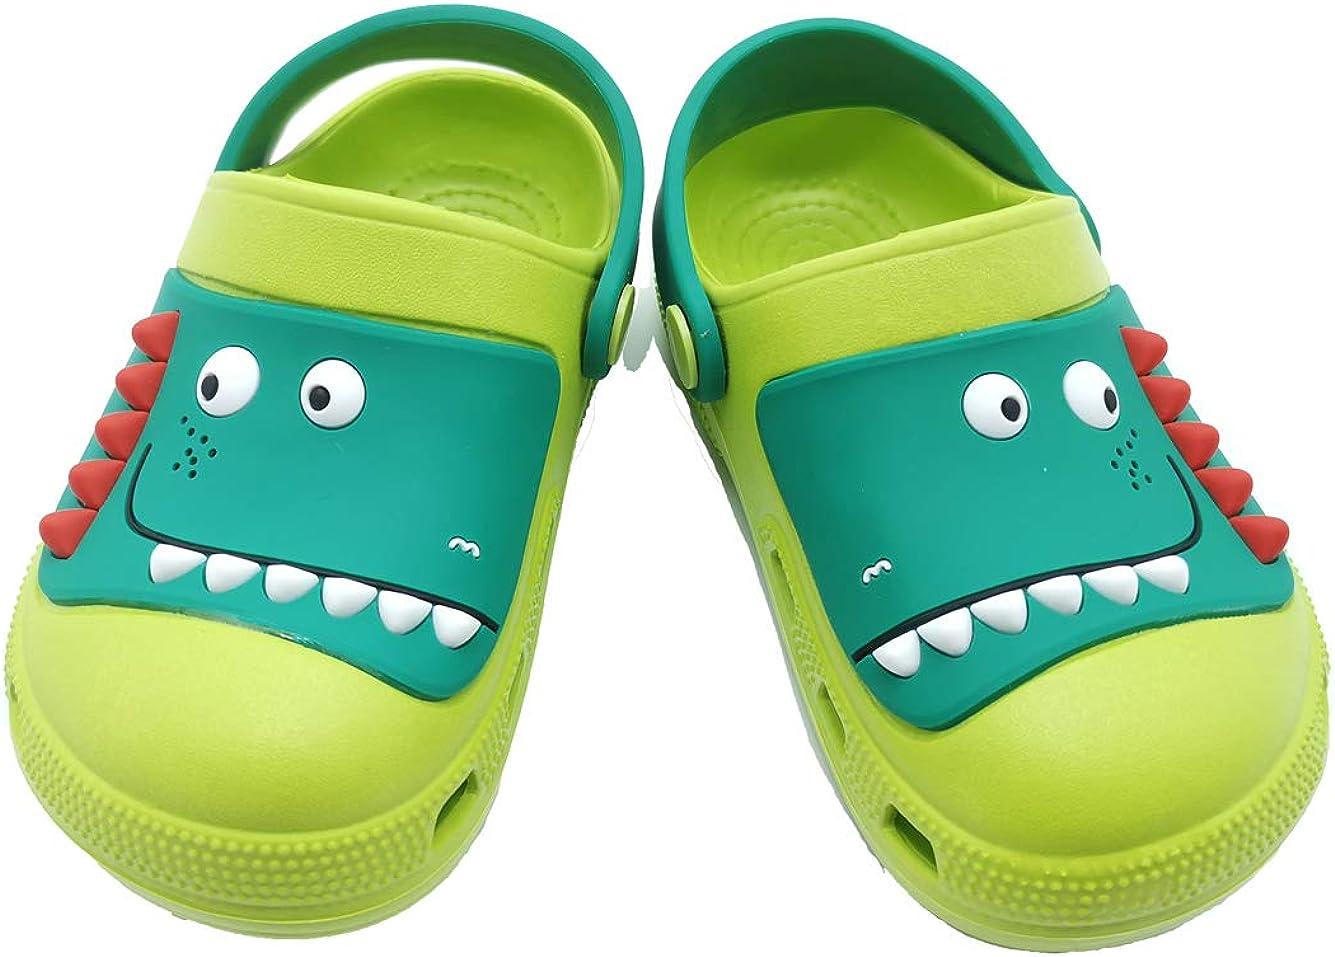 lghdzsw favorite Boys Girls Garden Tucson Mall Clogs Slippers San Cartoon Slides Kids